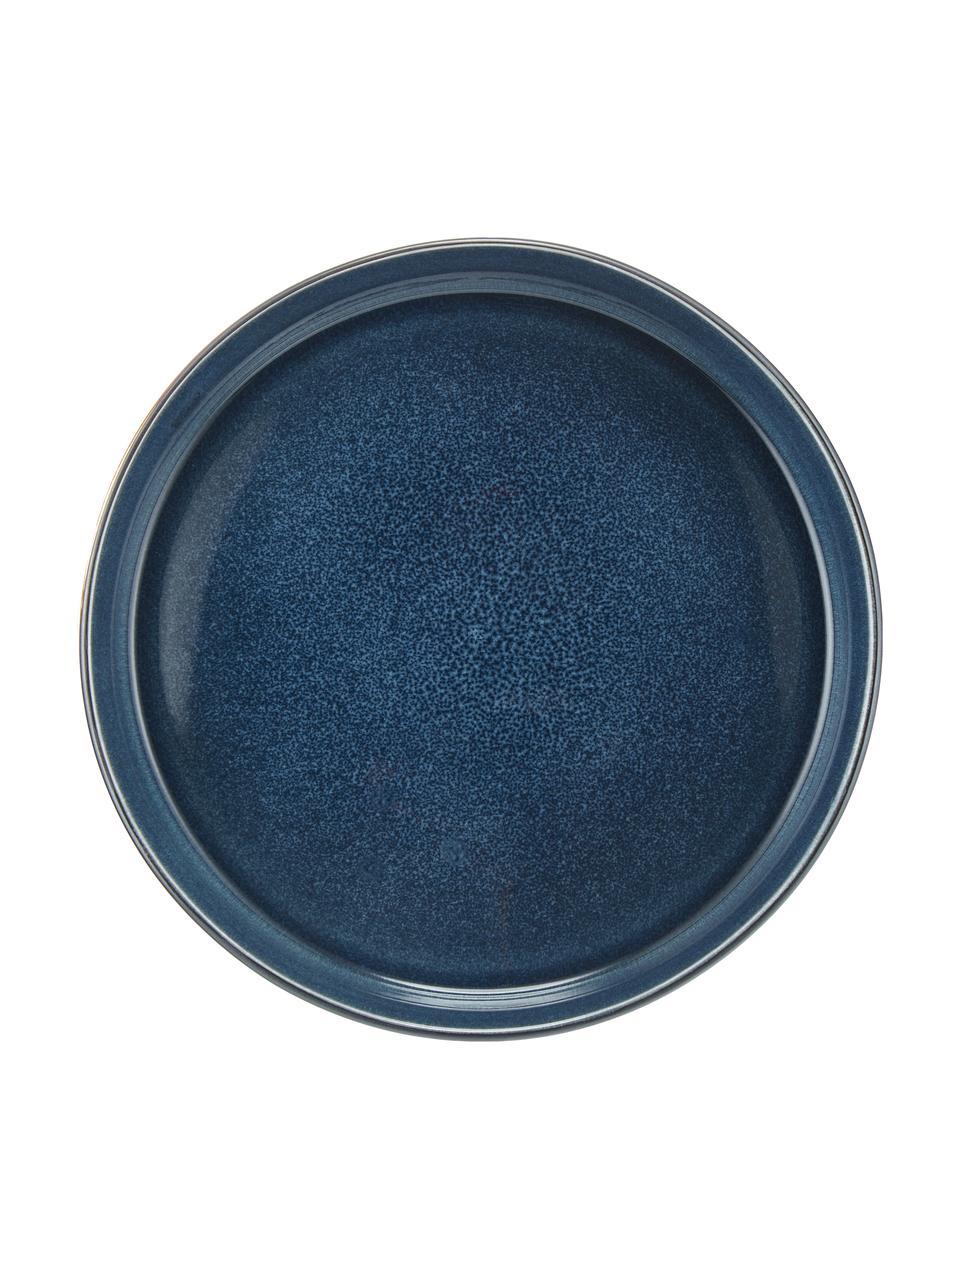 Piatto fondo artigianale Quintana 2 pz, Porcellana, Blu, marrone, Ø 23 cm